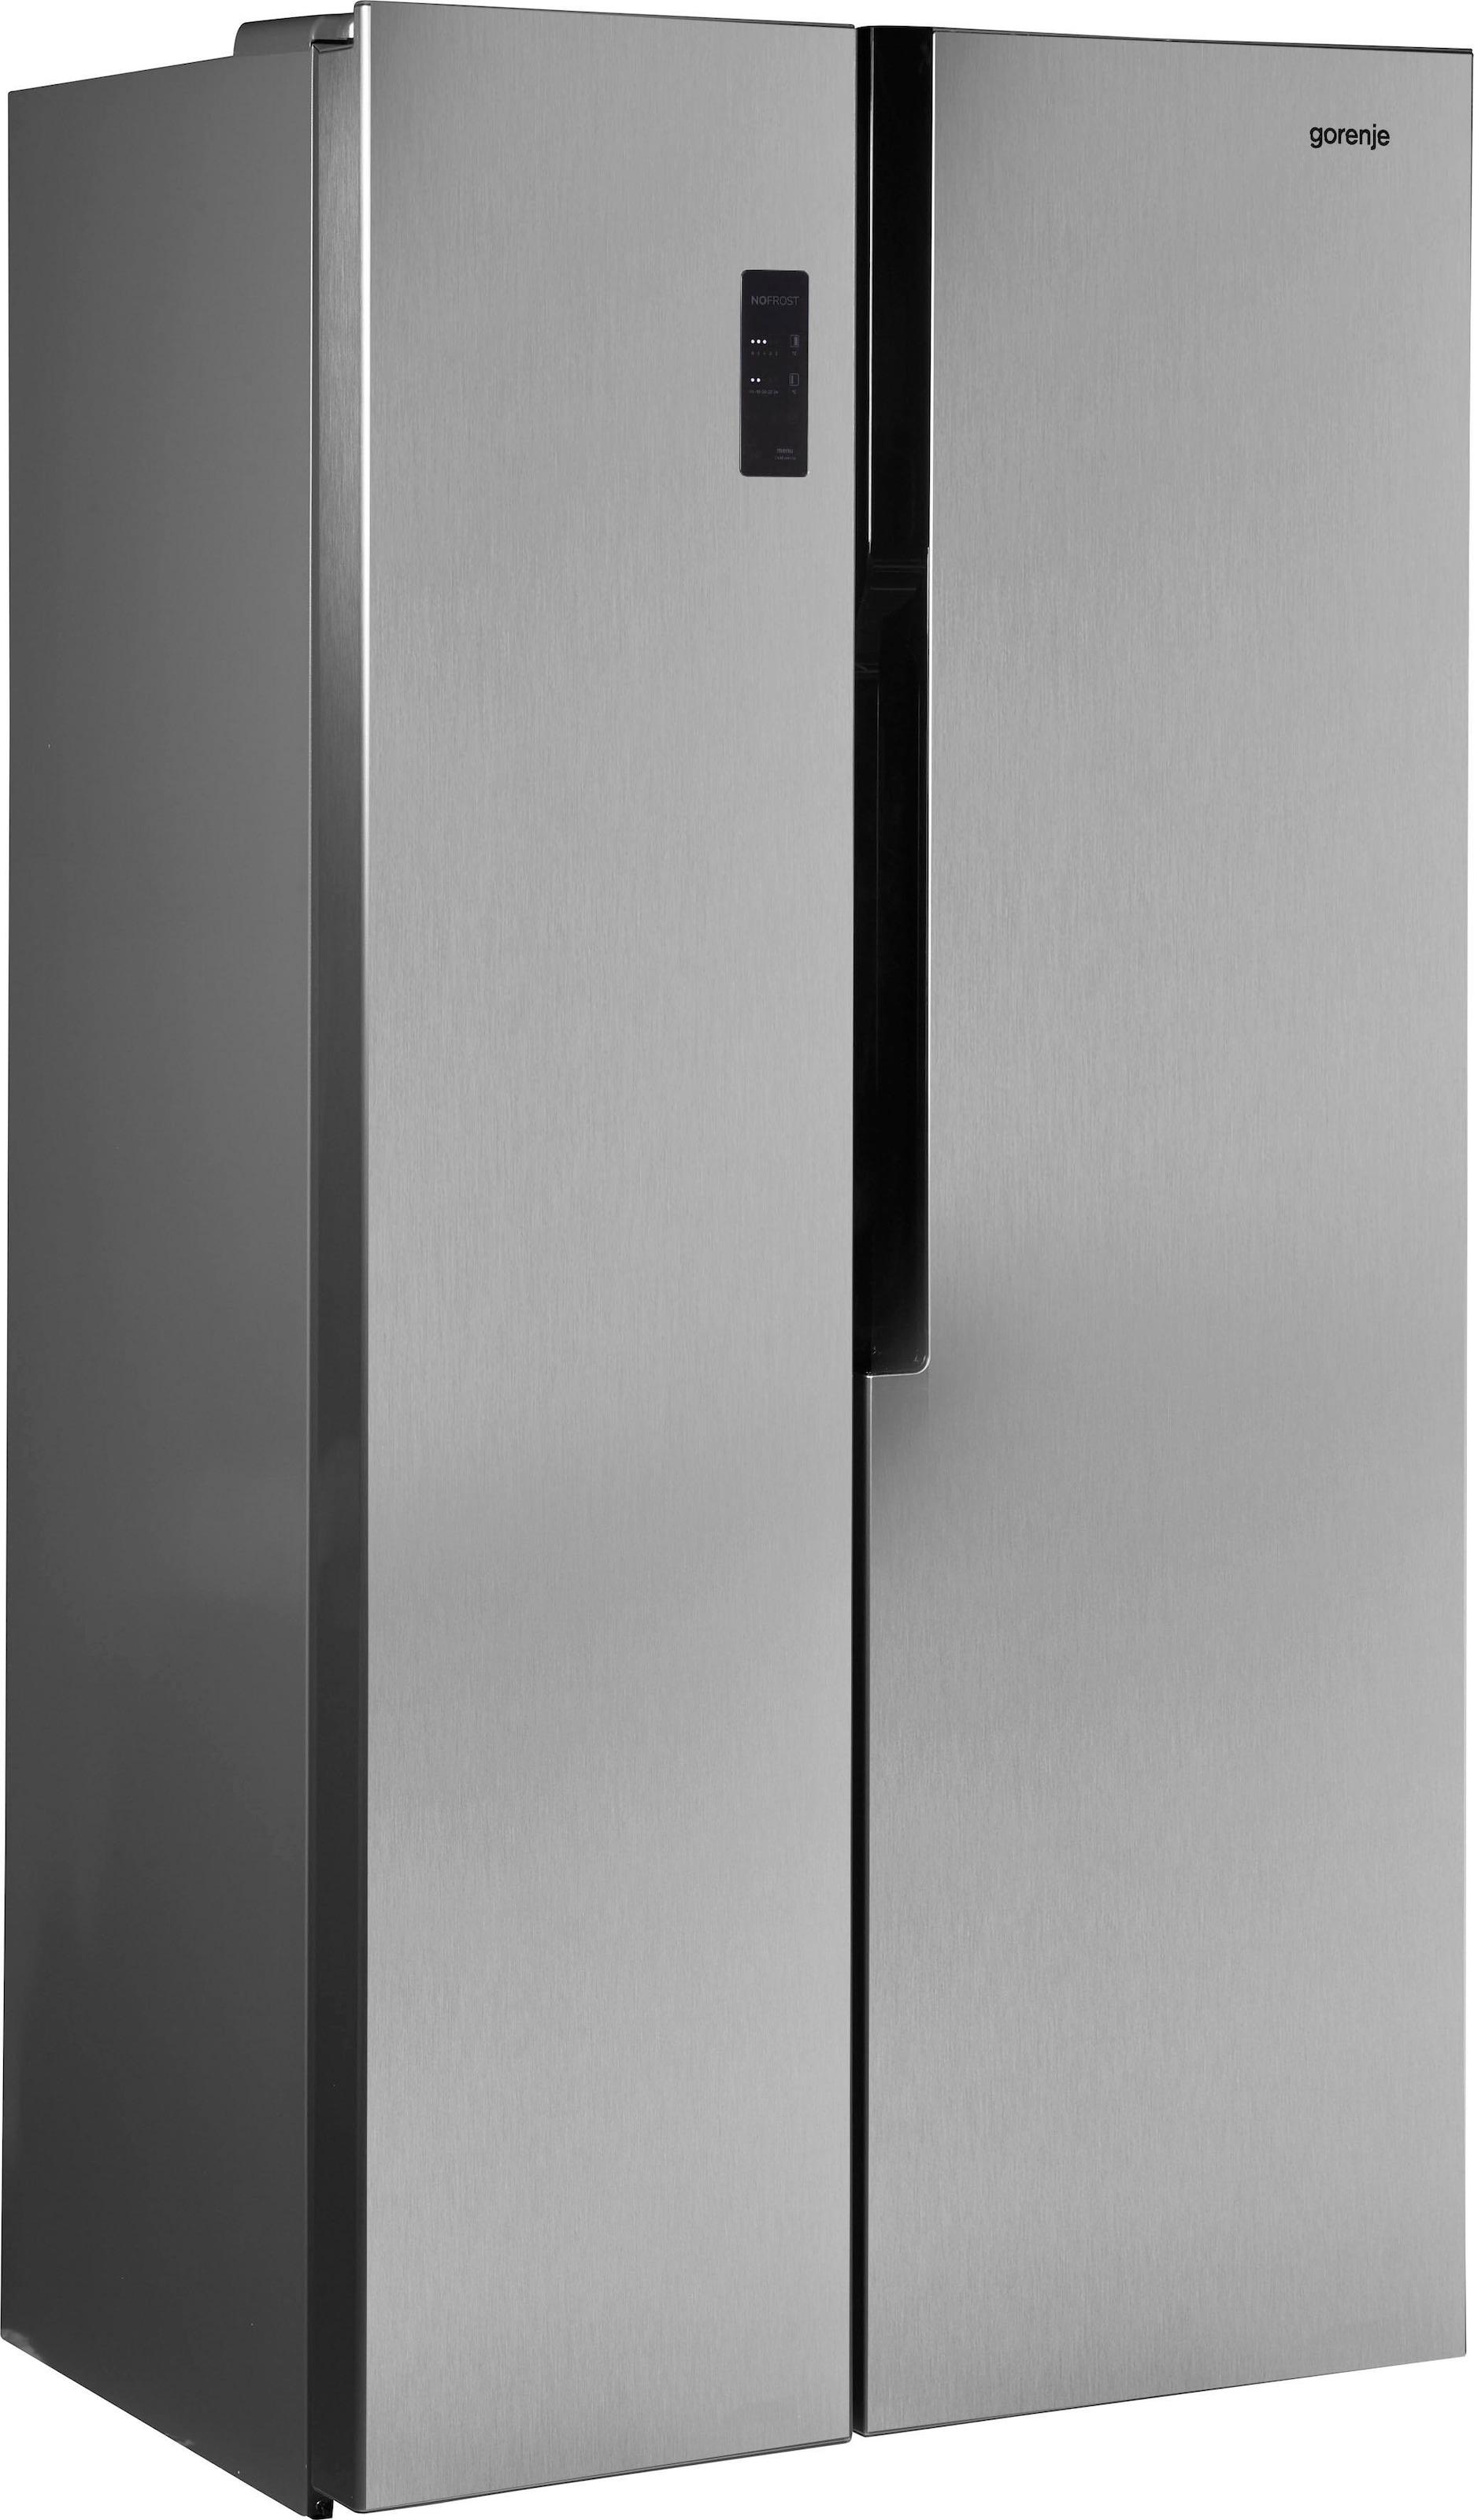 Side By Side Kühlschrank Gorenje : Gorenje kühlschränke onlineshop gorenje kühlschränke online